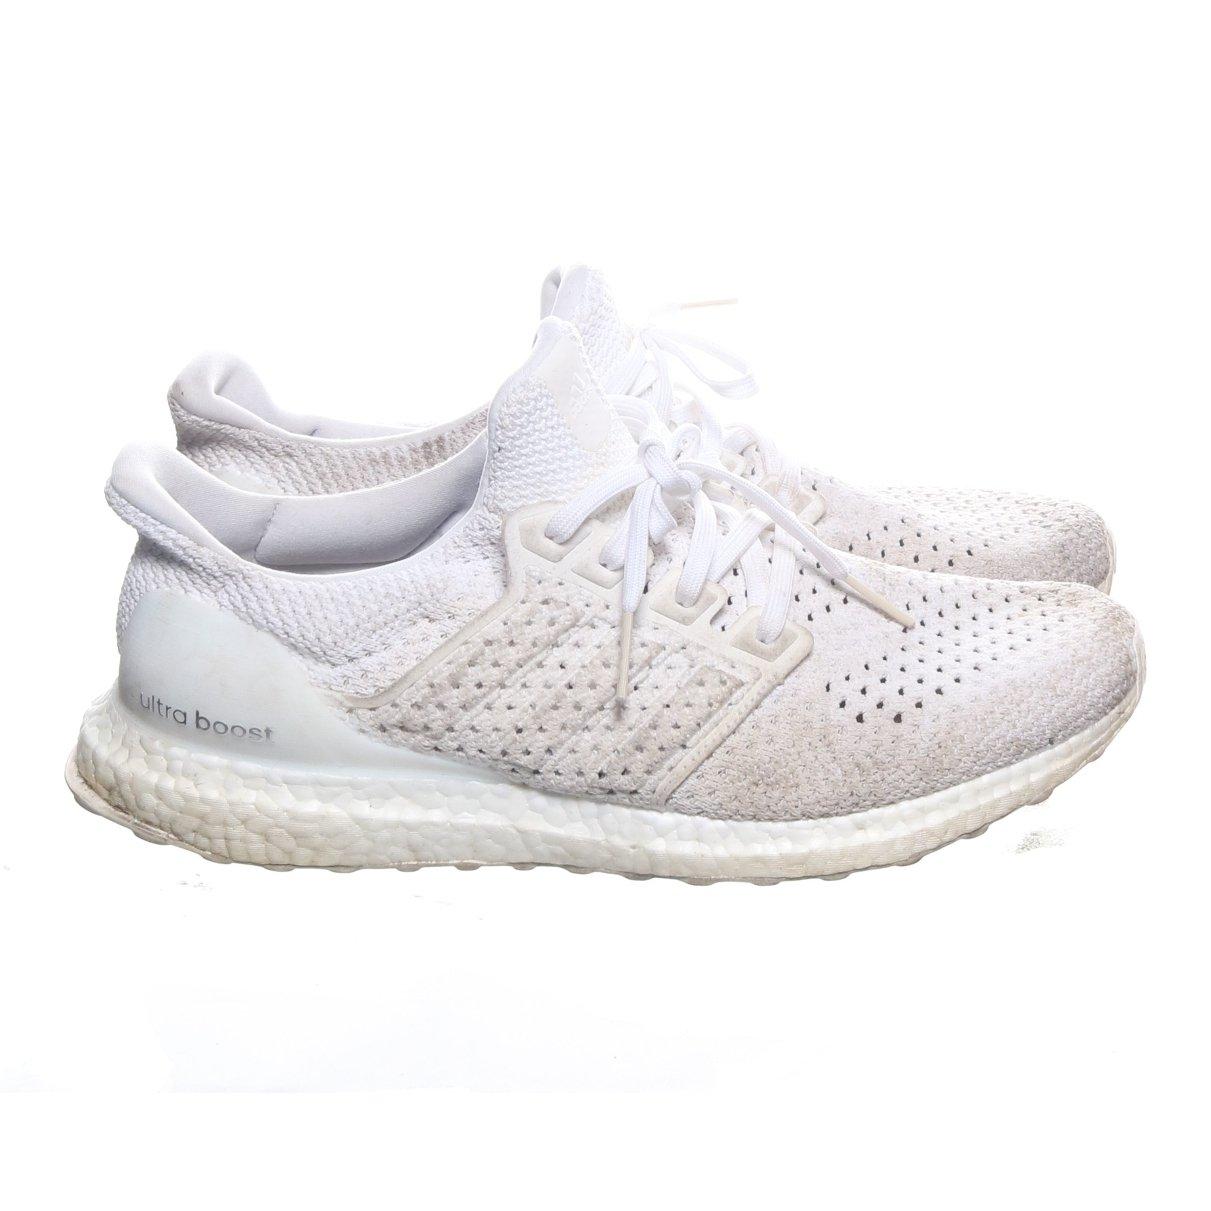 Adidas, Sneakers, Strl: 46, Ultra Boost, Vit (384300070) ᐈ